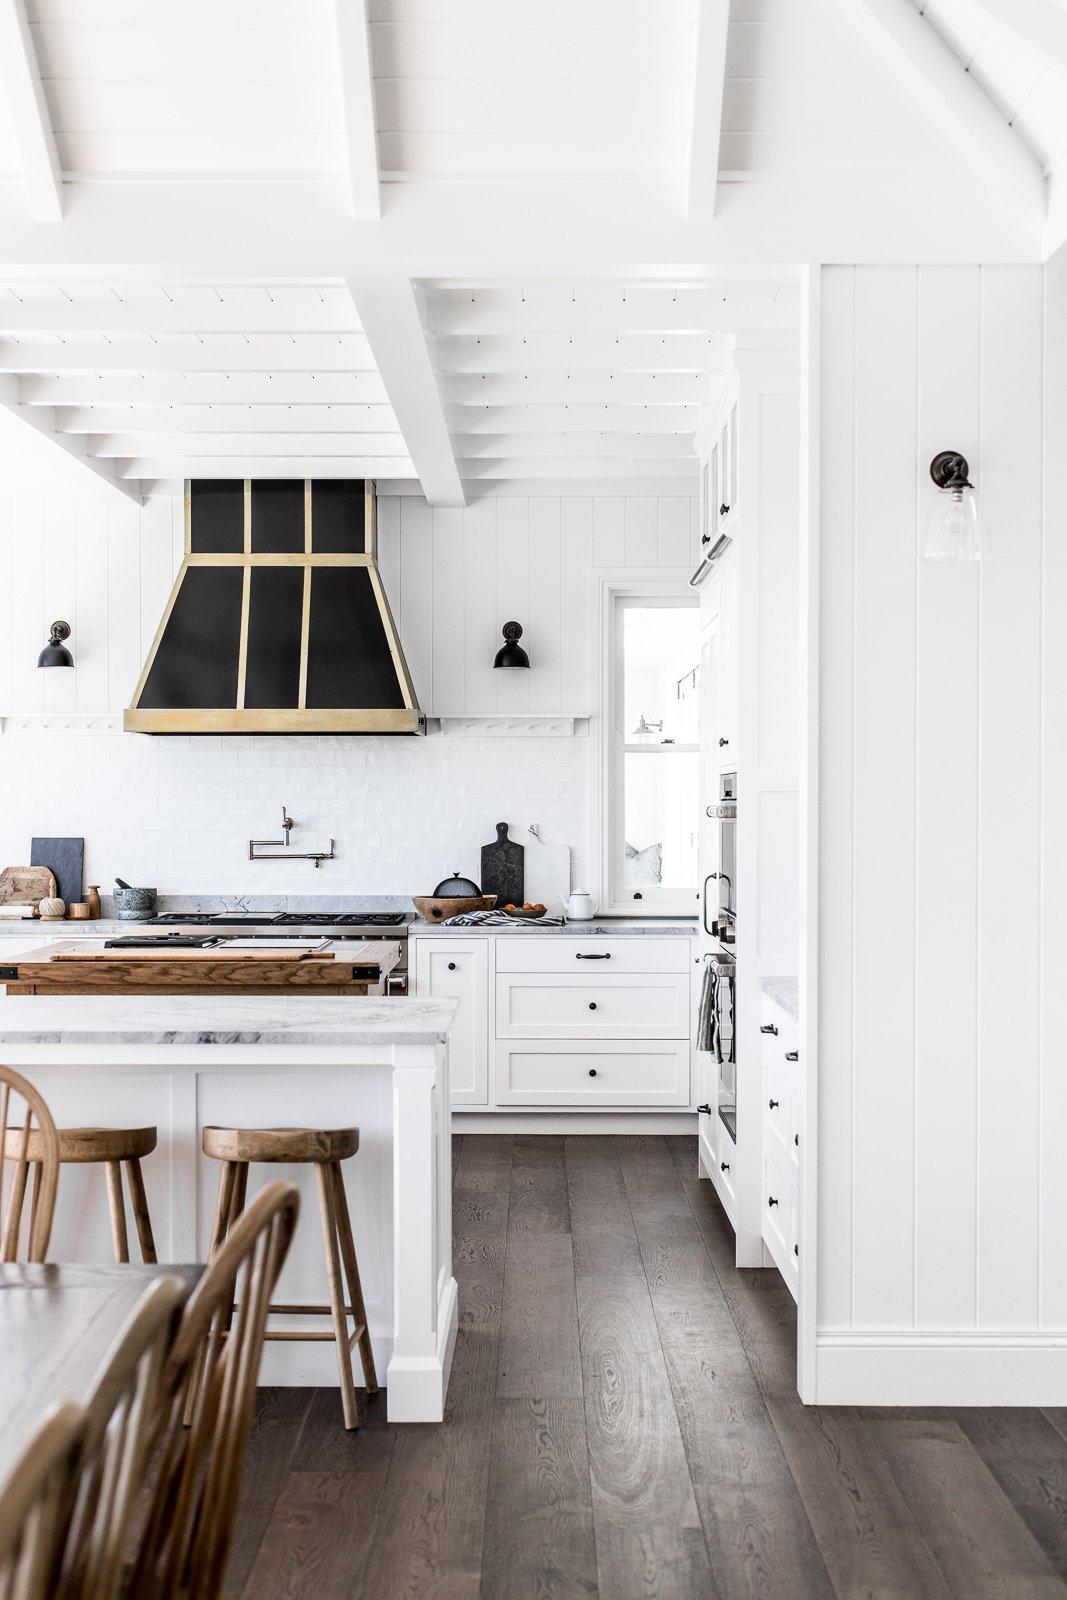 white shaker kitchen with oak floors and metal range